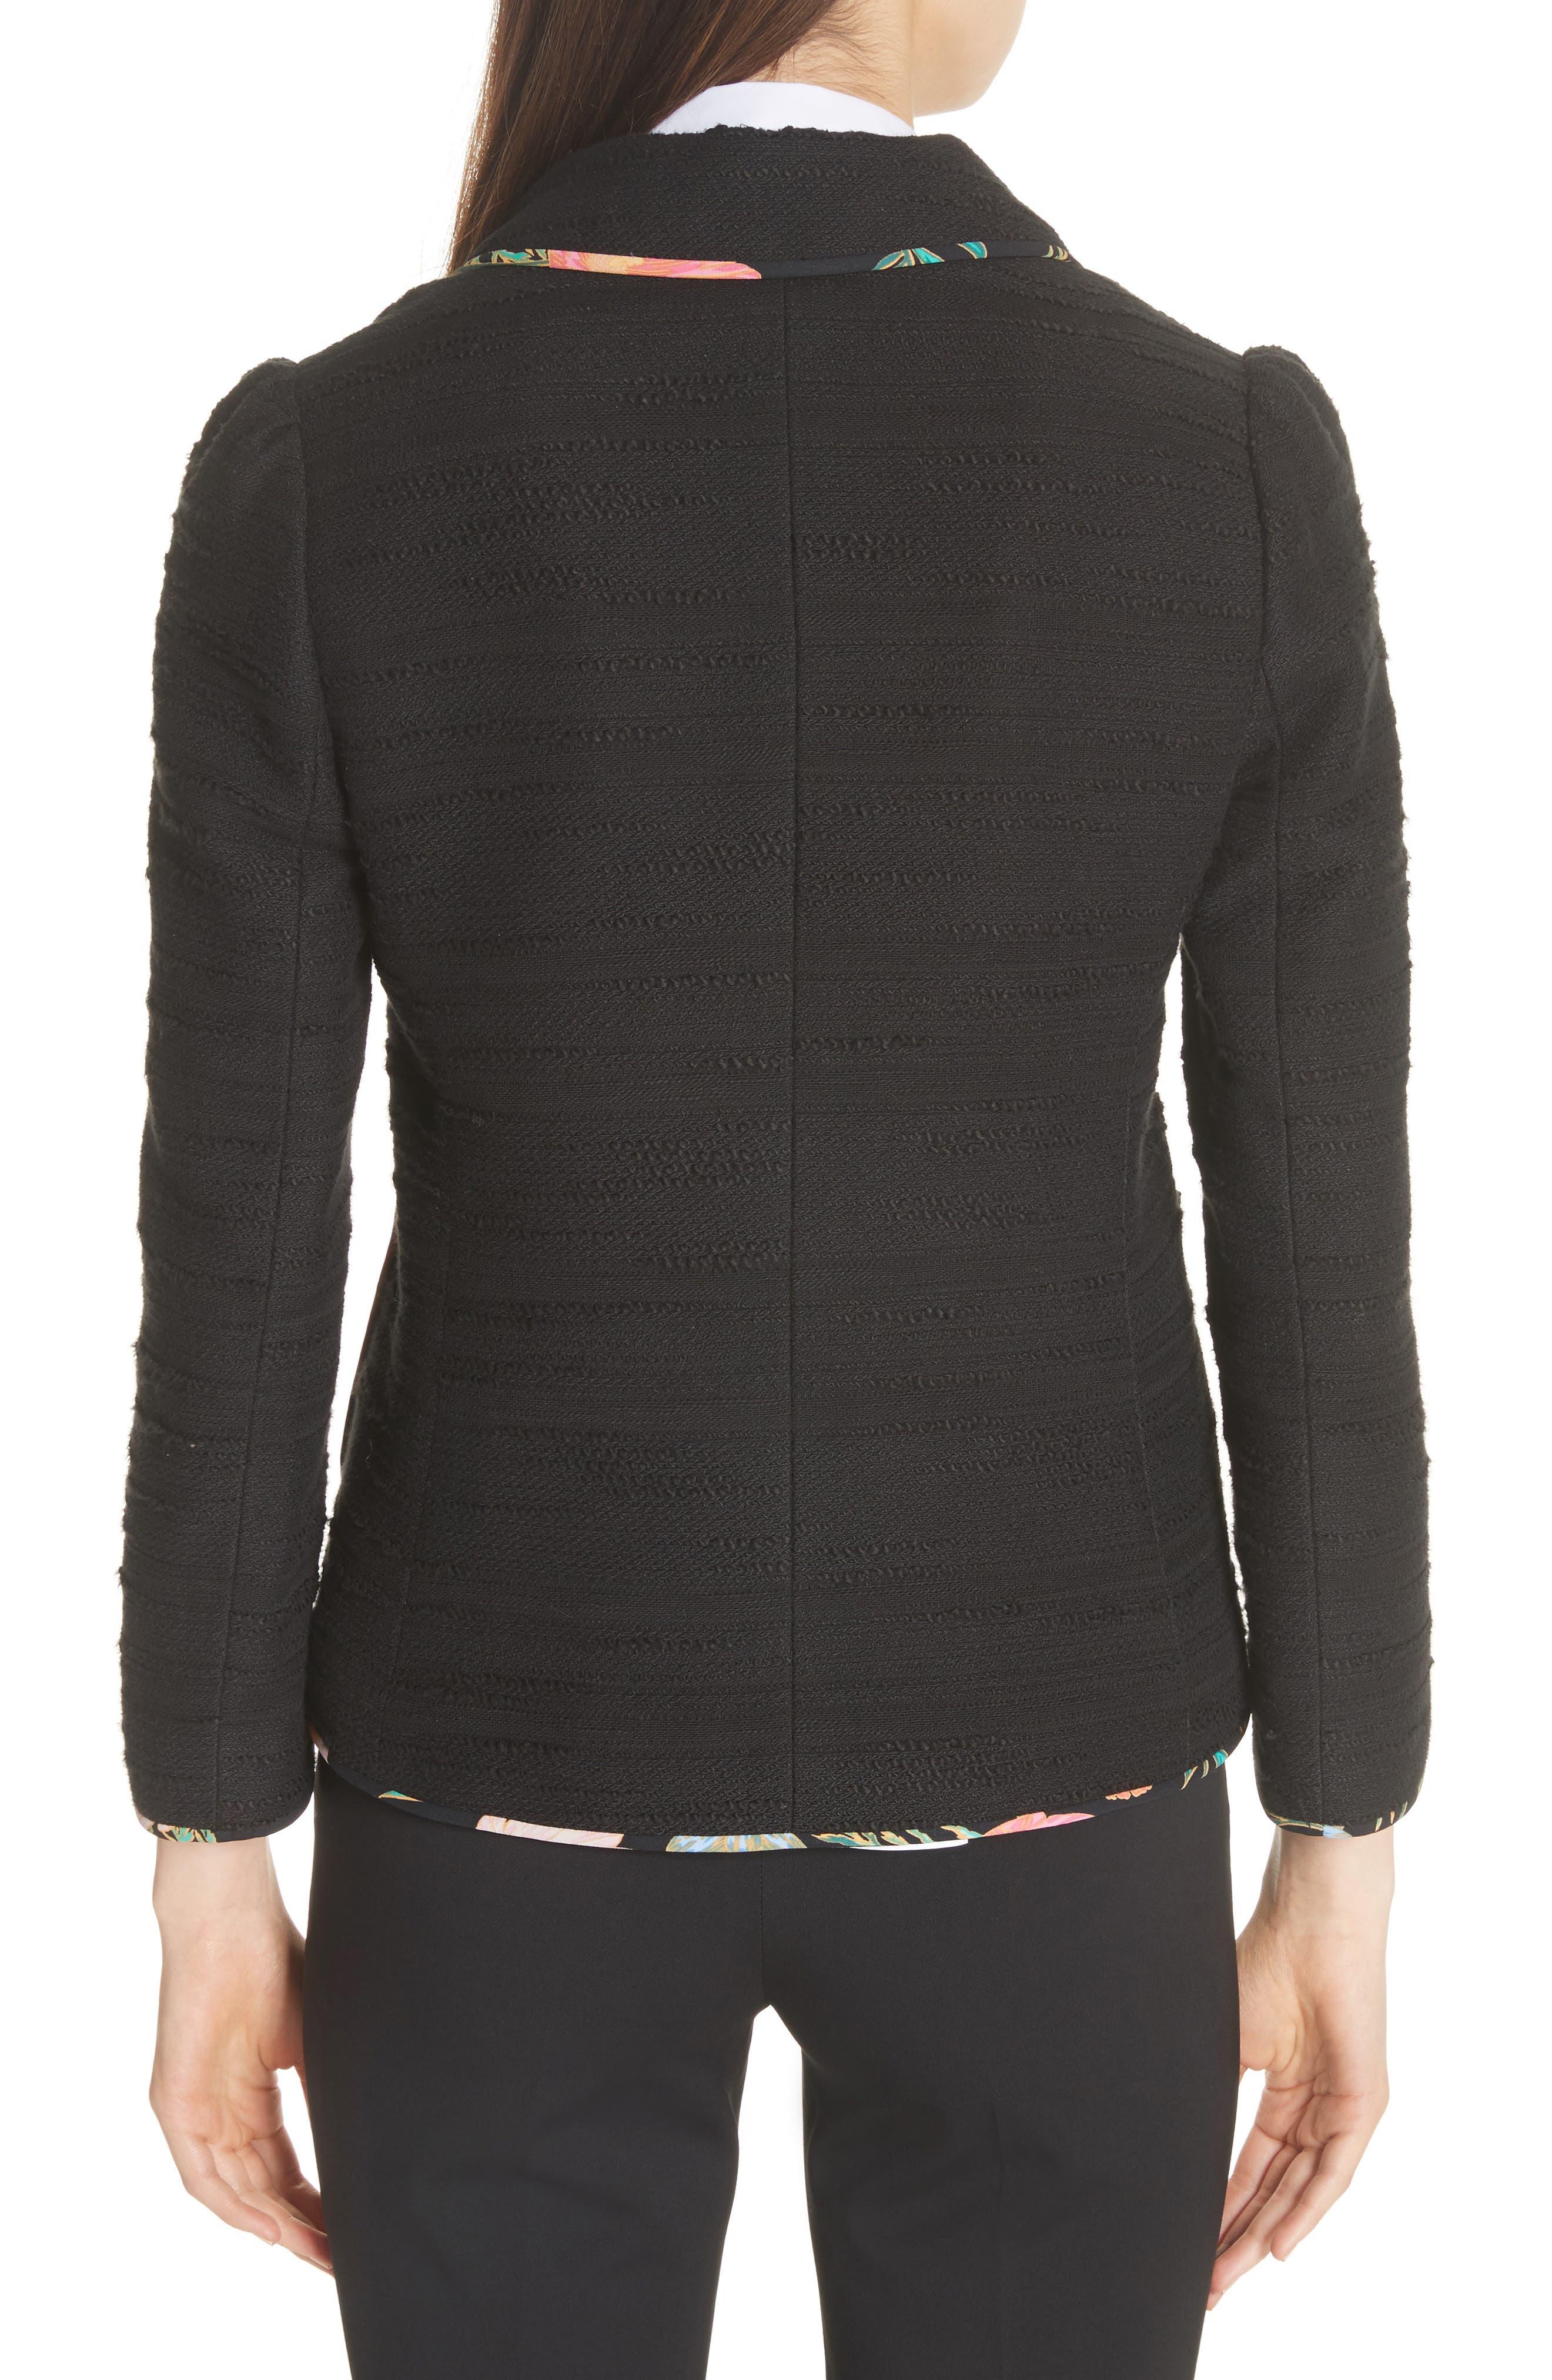 blossom trim tweed jacket,                             Alternate thumbnail 2, color,                             Black